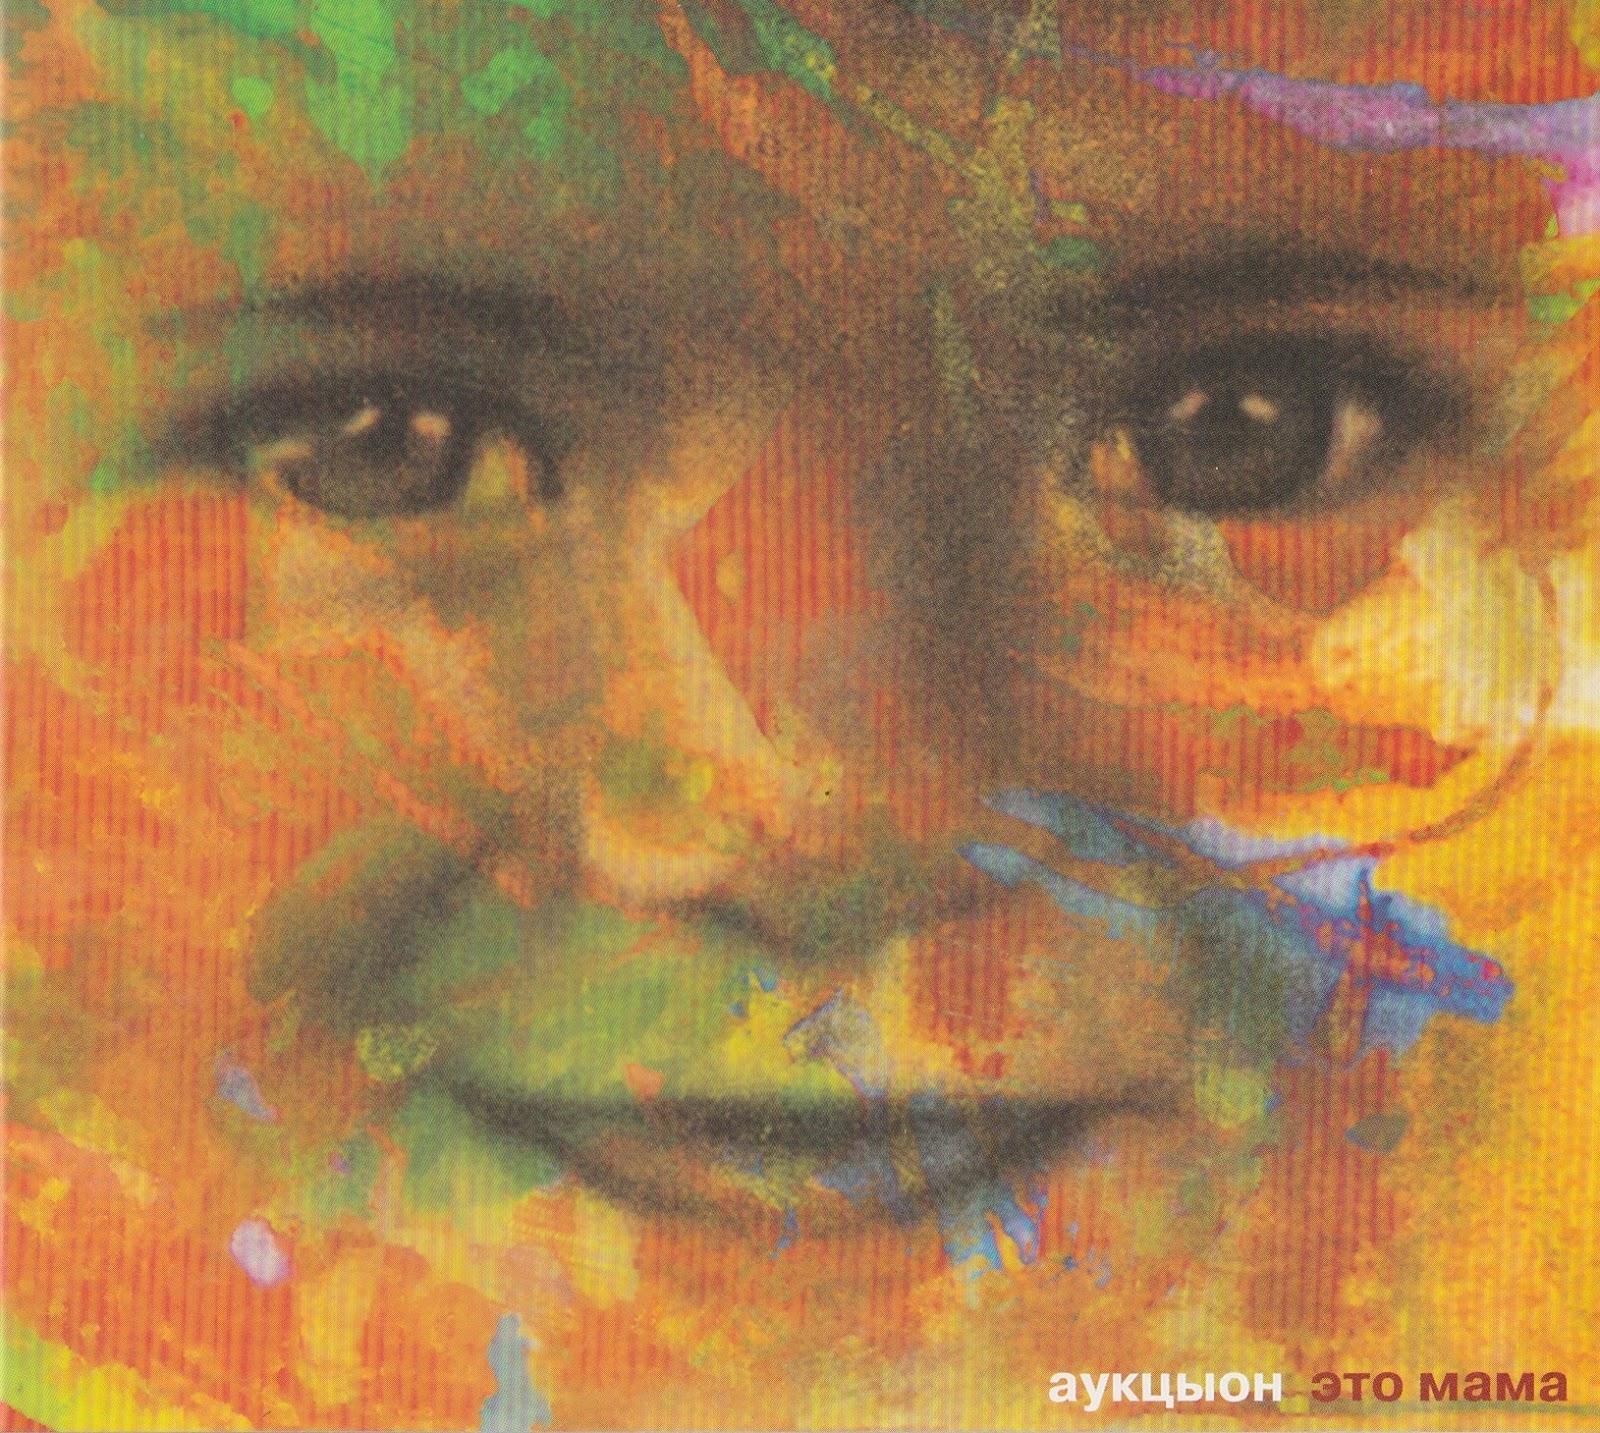 АукцЫон — Это Мама (2002)